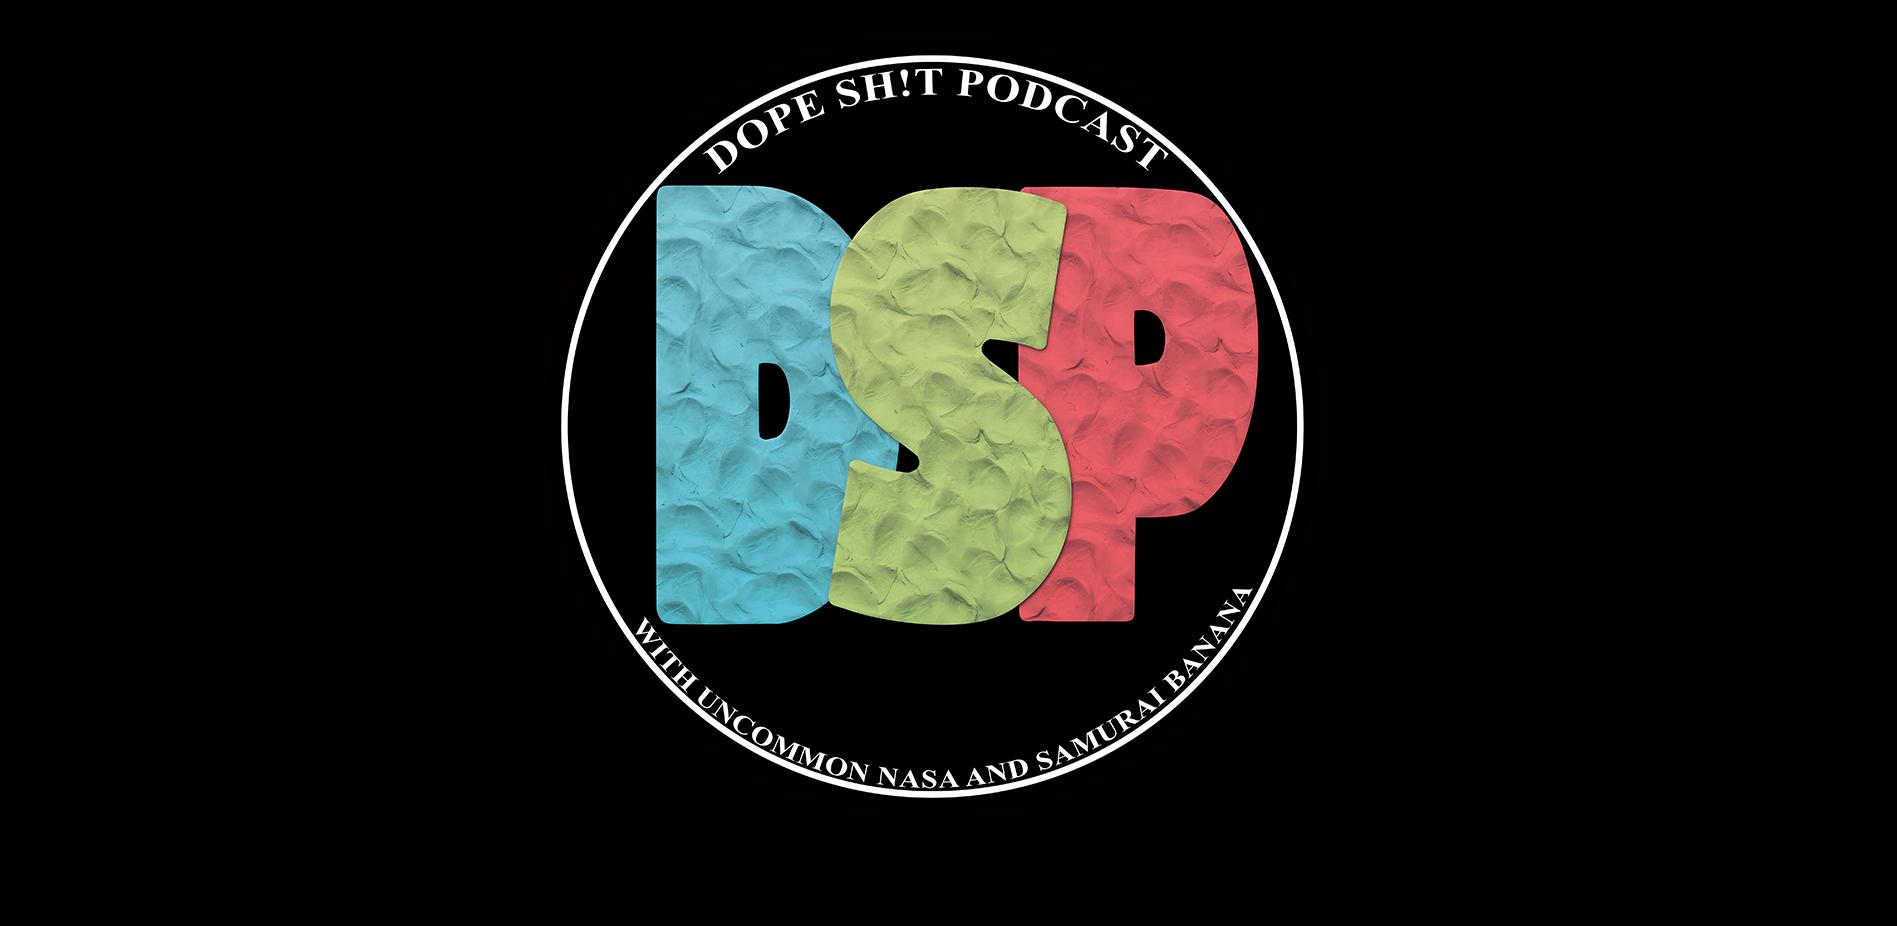 DSP Website Image BackgroundPage.jpg